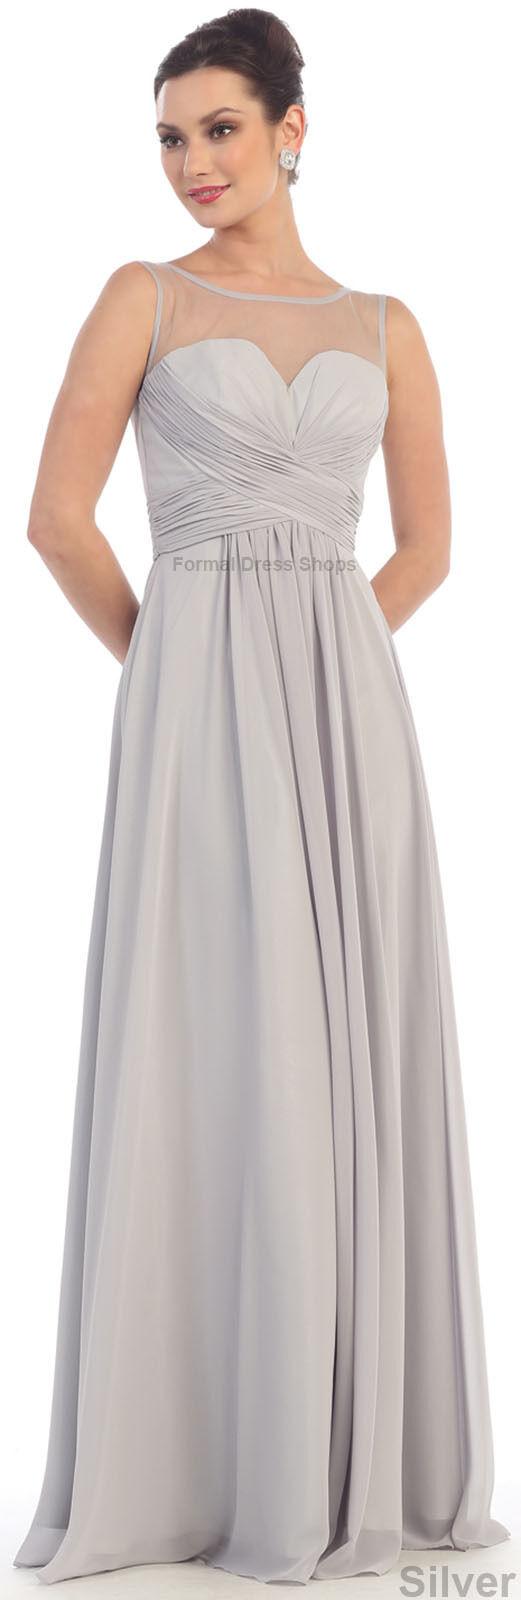 Demoiselle D& 039;Honn Long Robe de Soirée Bal Danse Simple Robe Habillée Doux